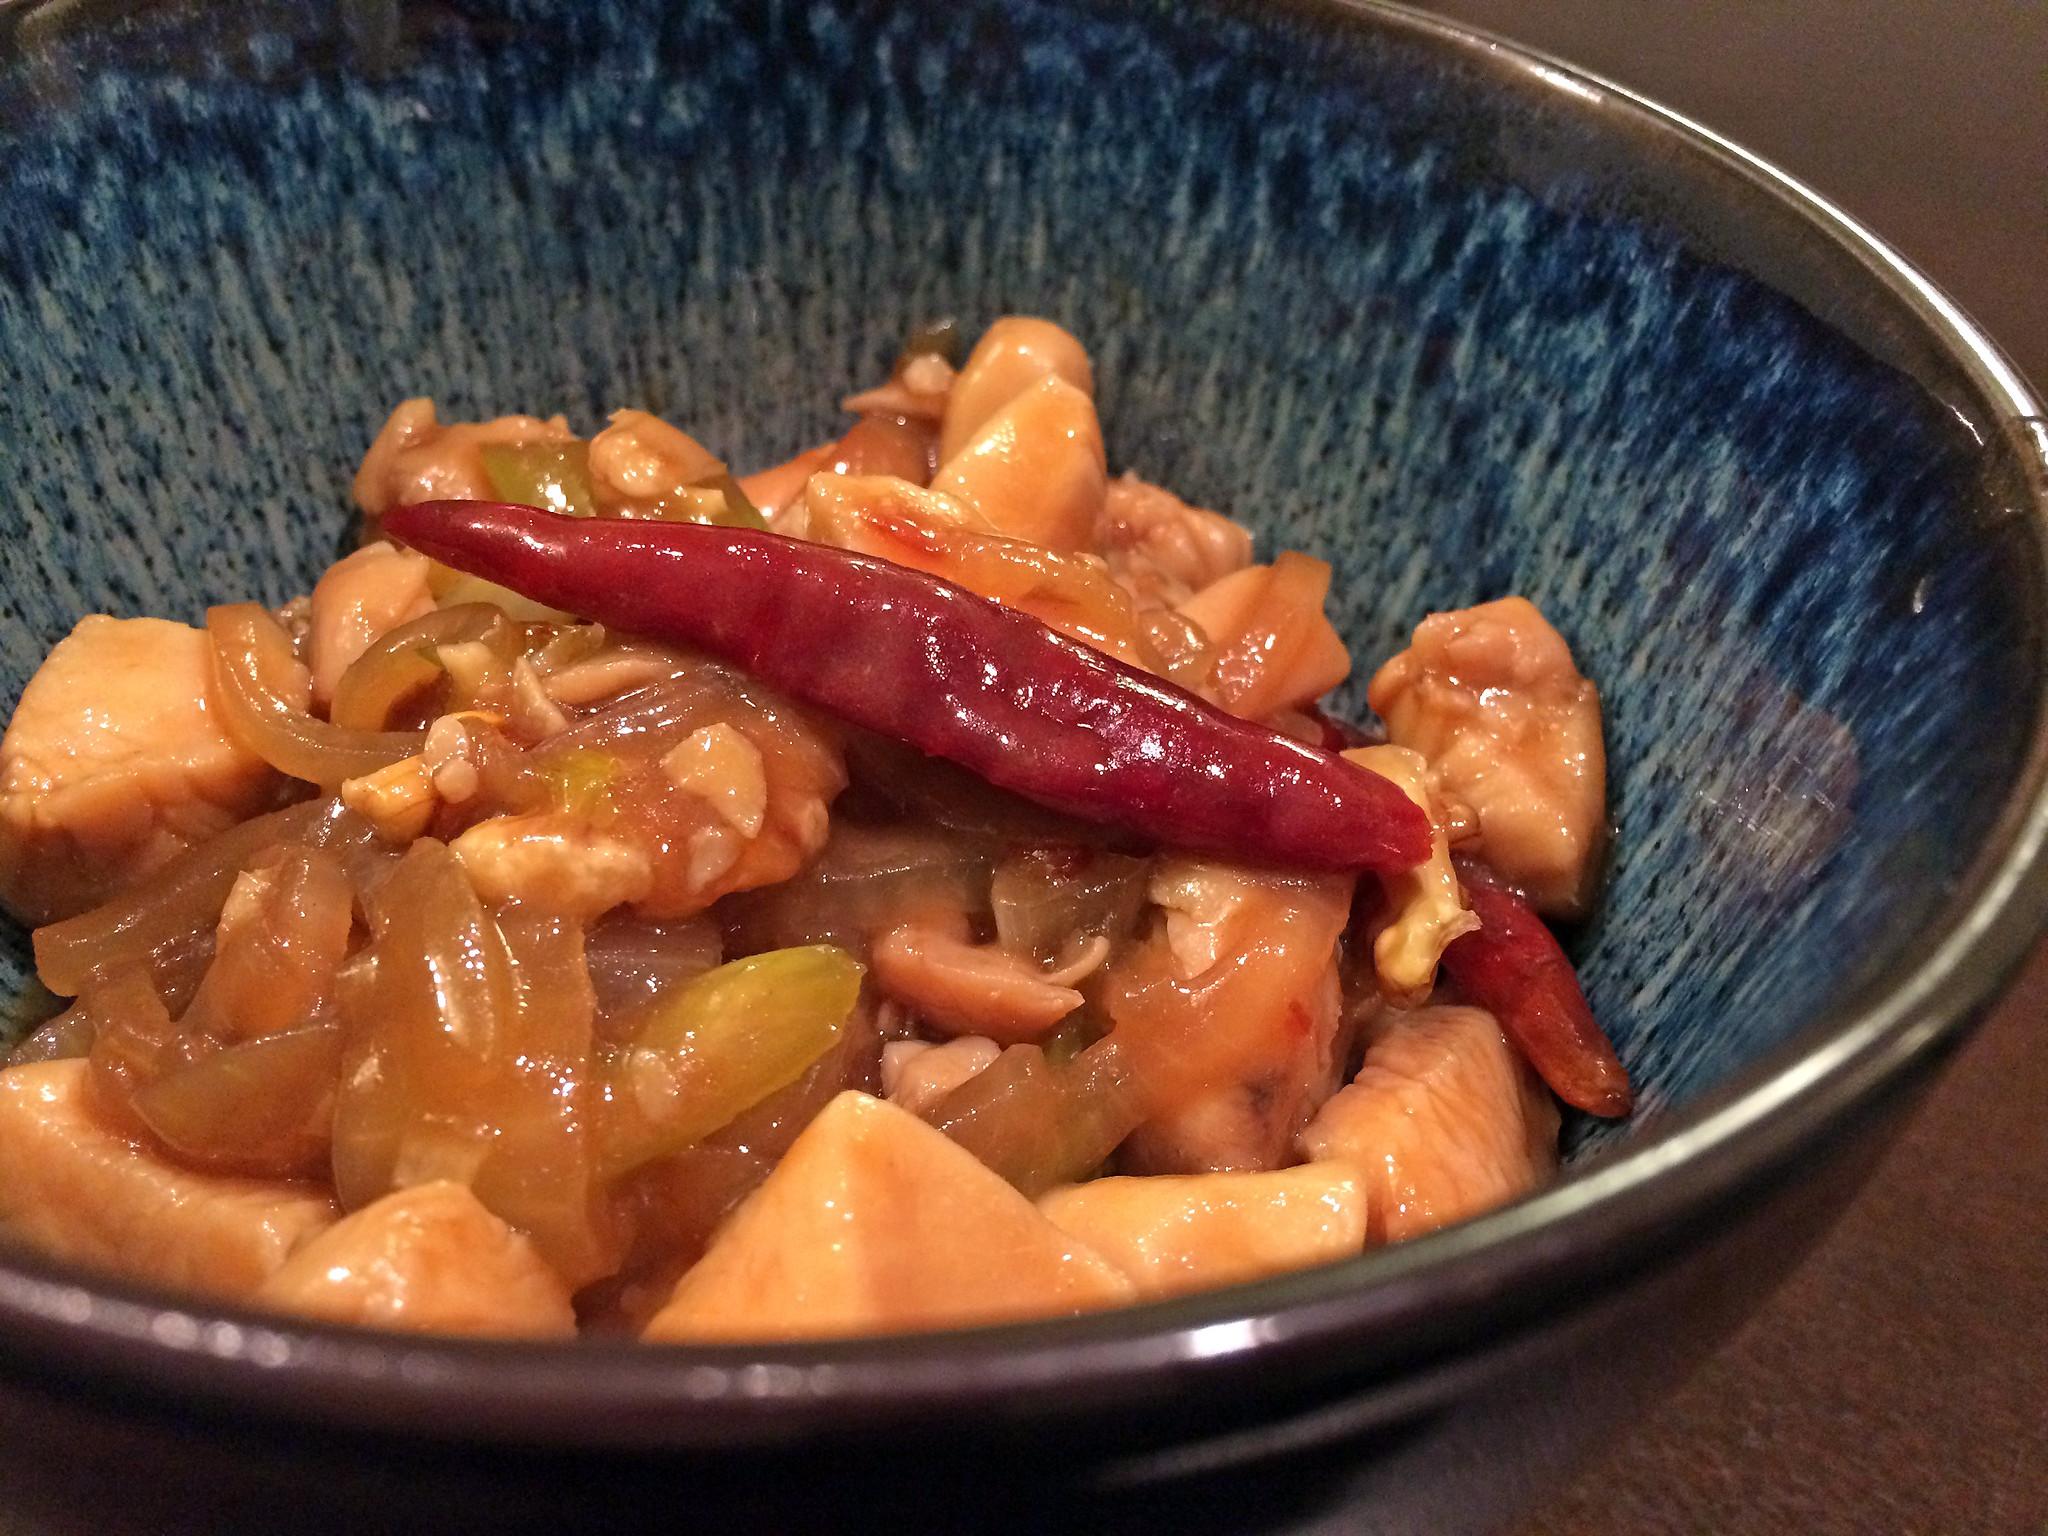 Xian-style chicken